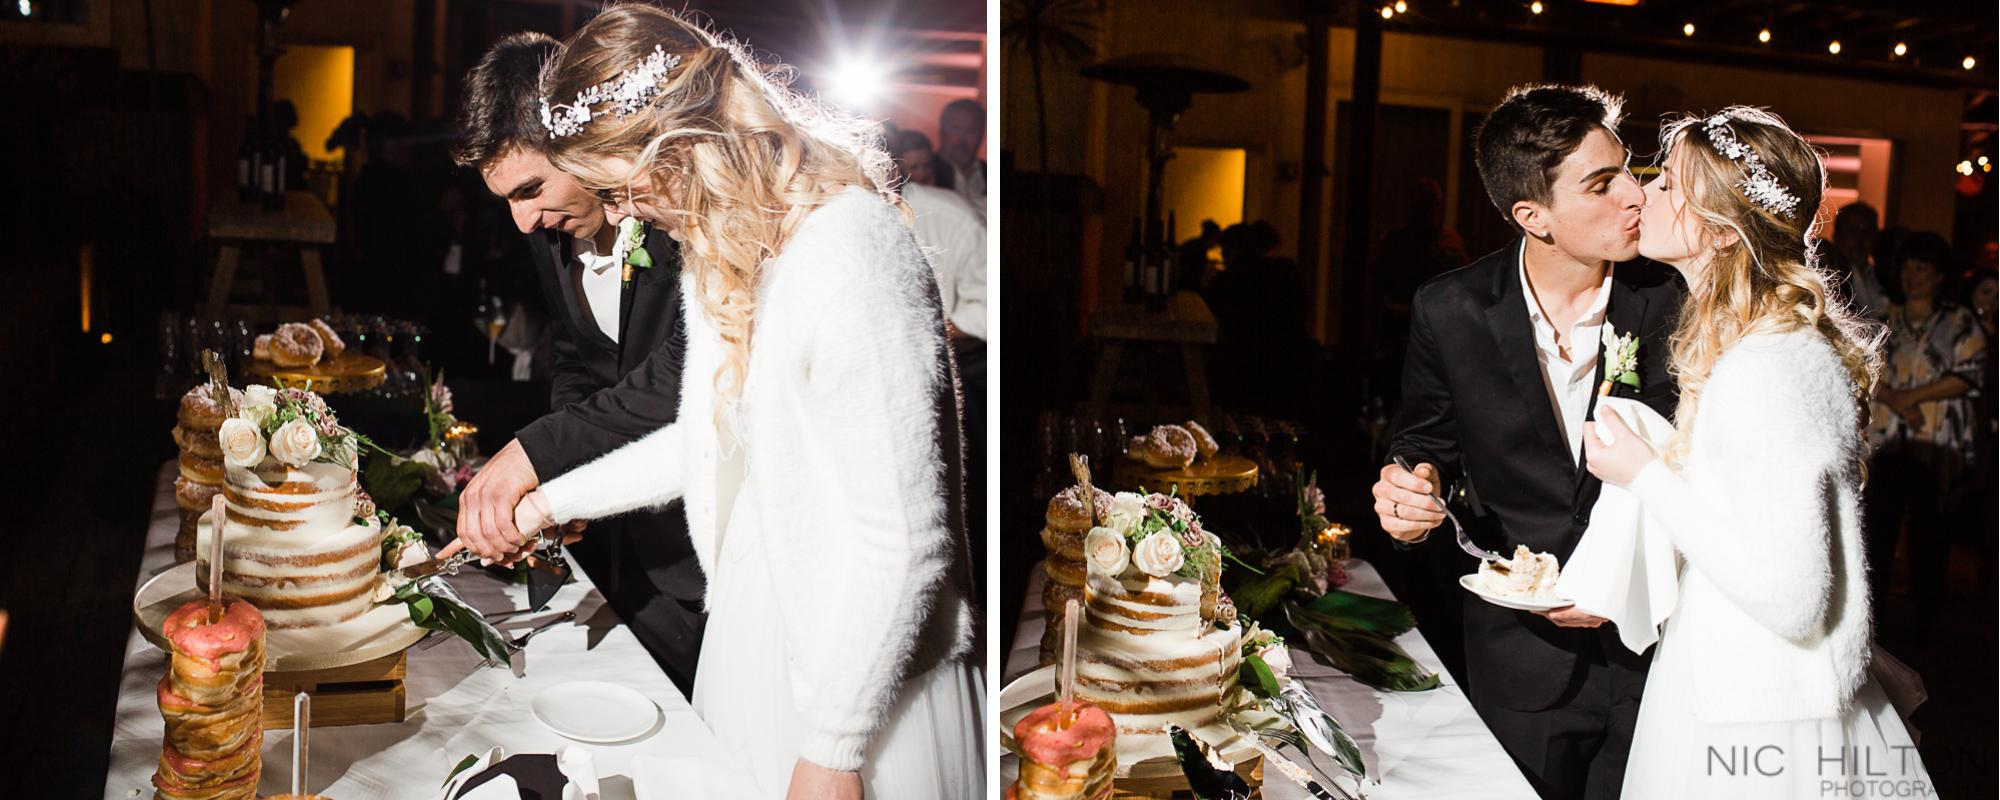 Cake-Cutting-Long-Beach-Wedding.jpg